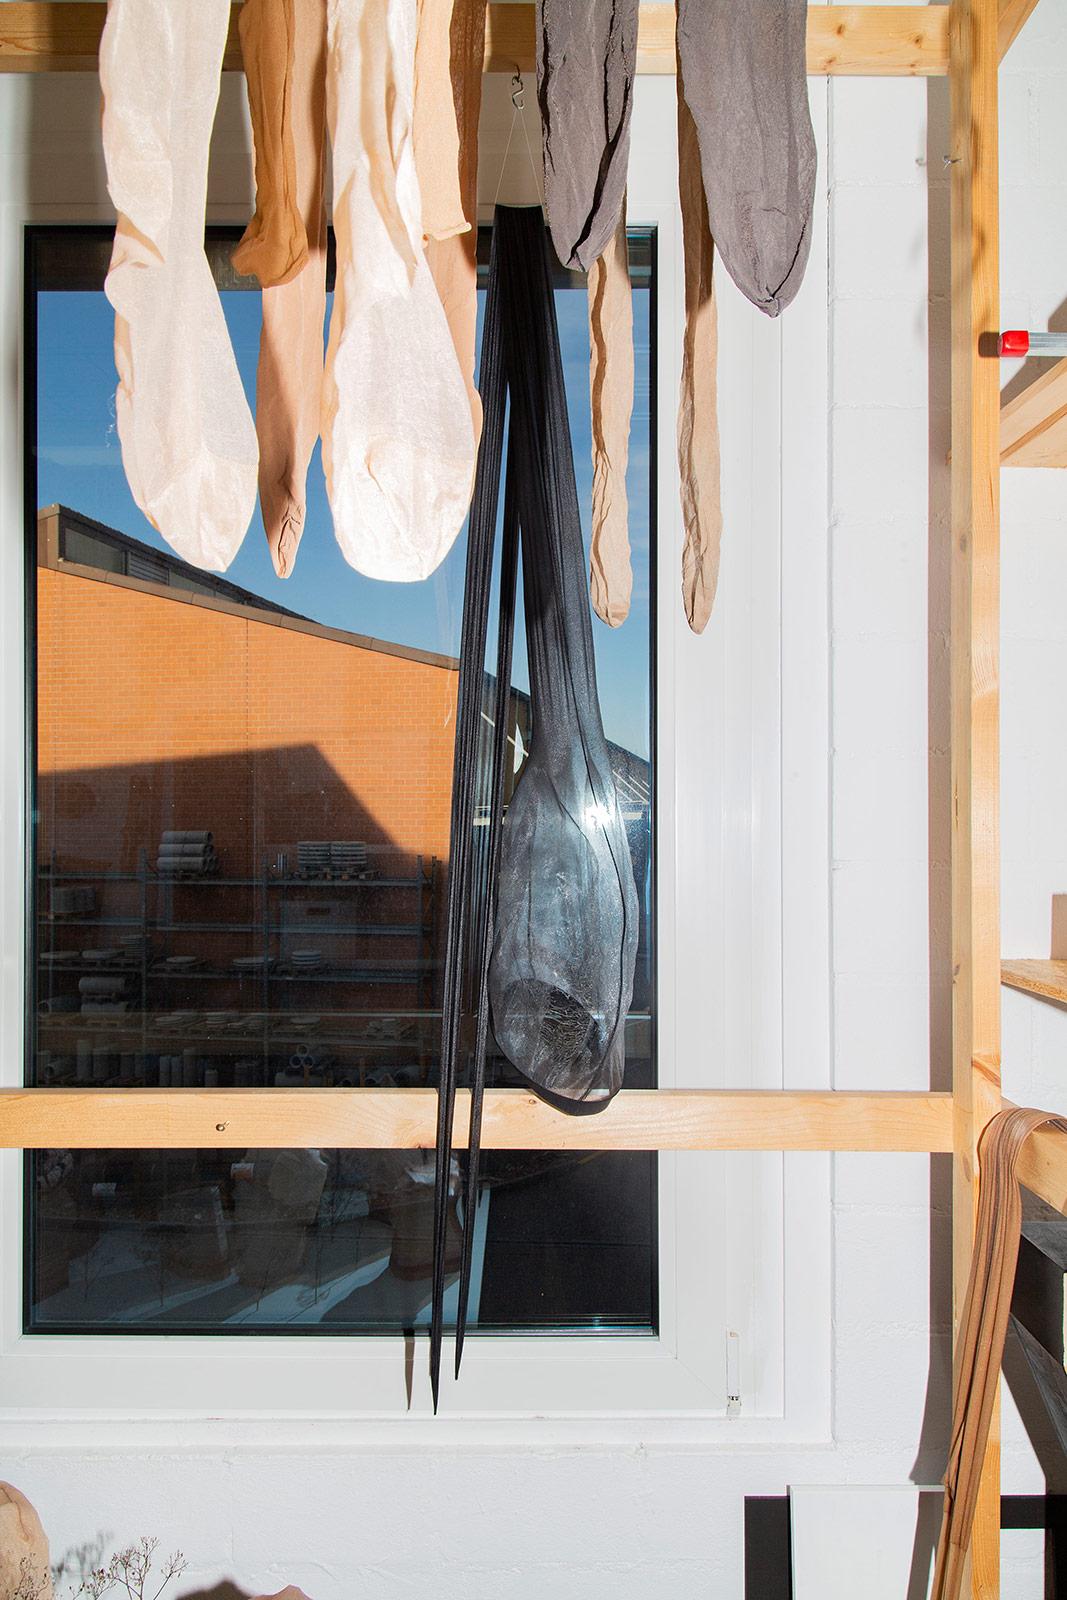 Aufgehängtes schwarzes Strumpfobjekt am Atelierfenster